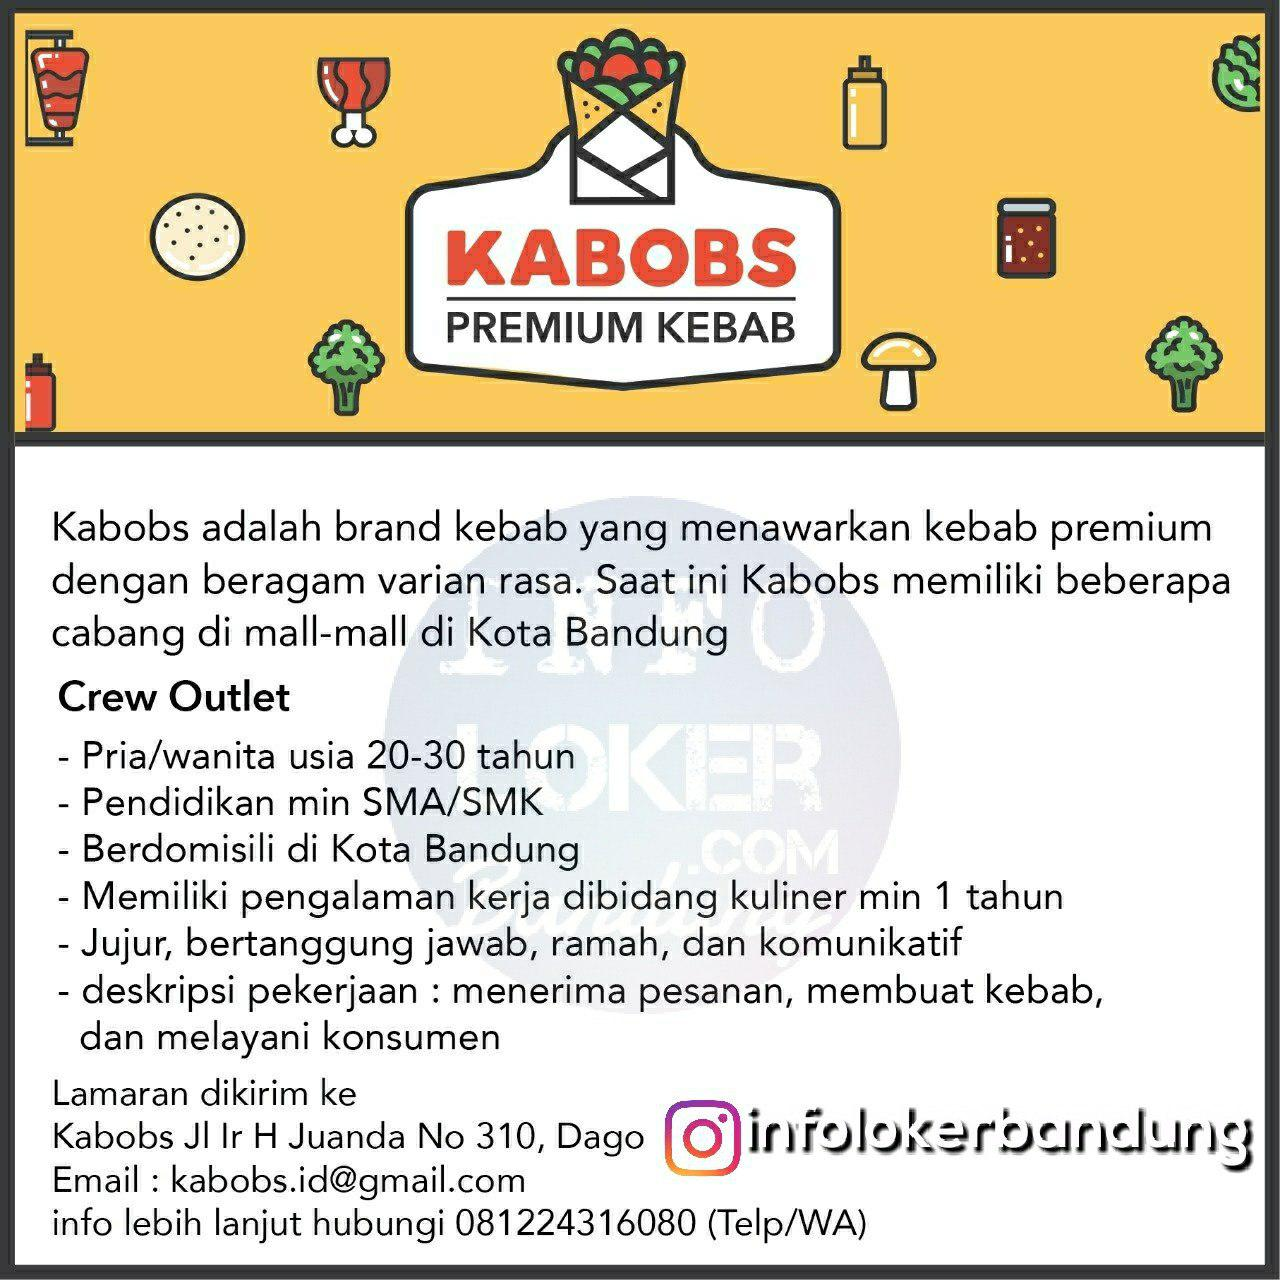 Lowongan Kerja Kabobs ( Premium Kebab ) Bandung Juli 2018 - infolokerbandung.com